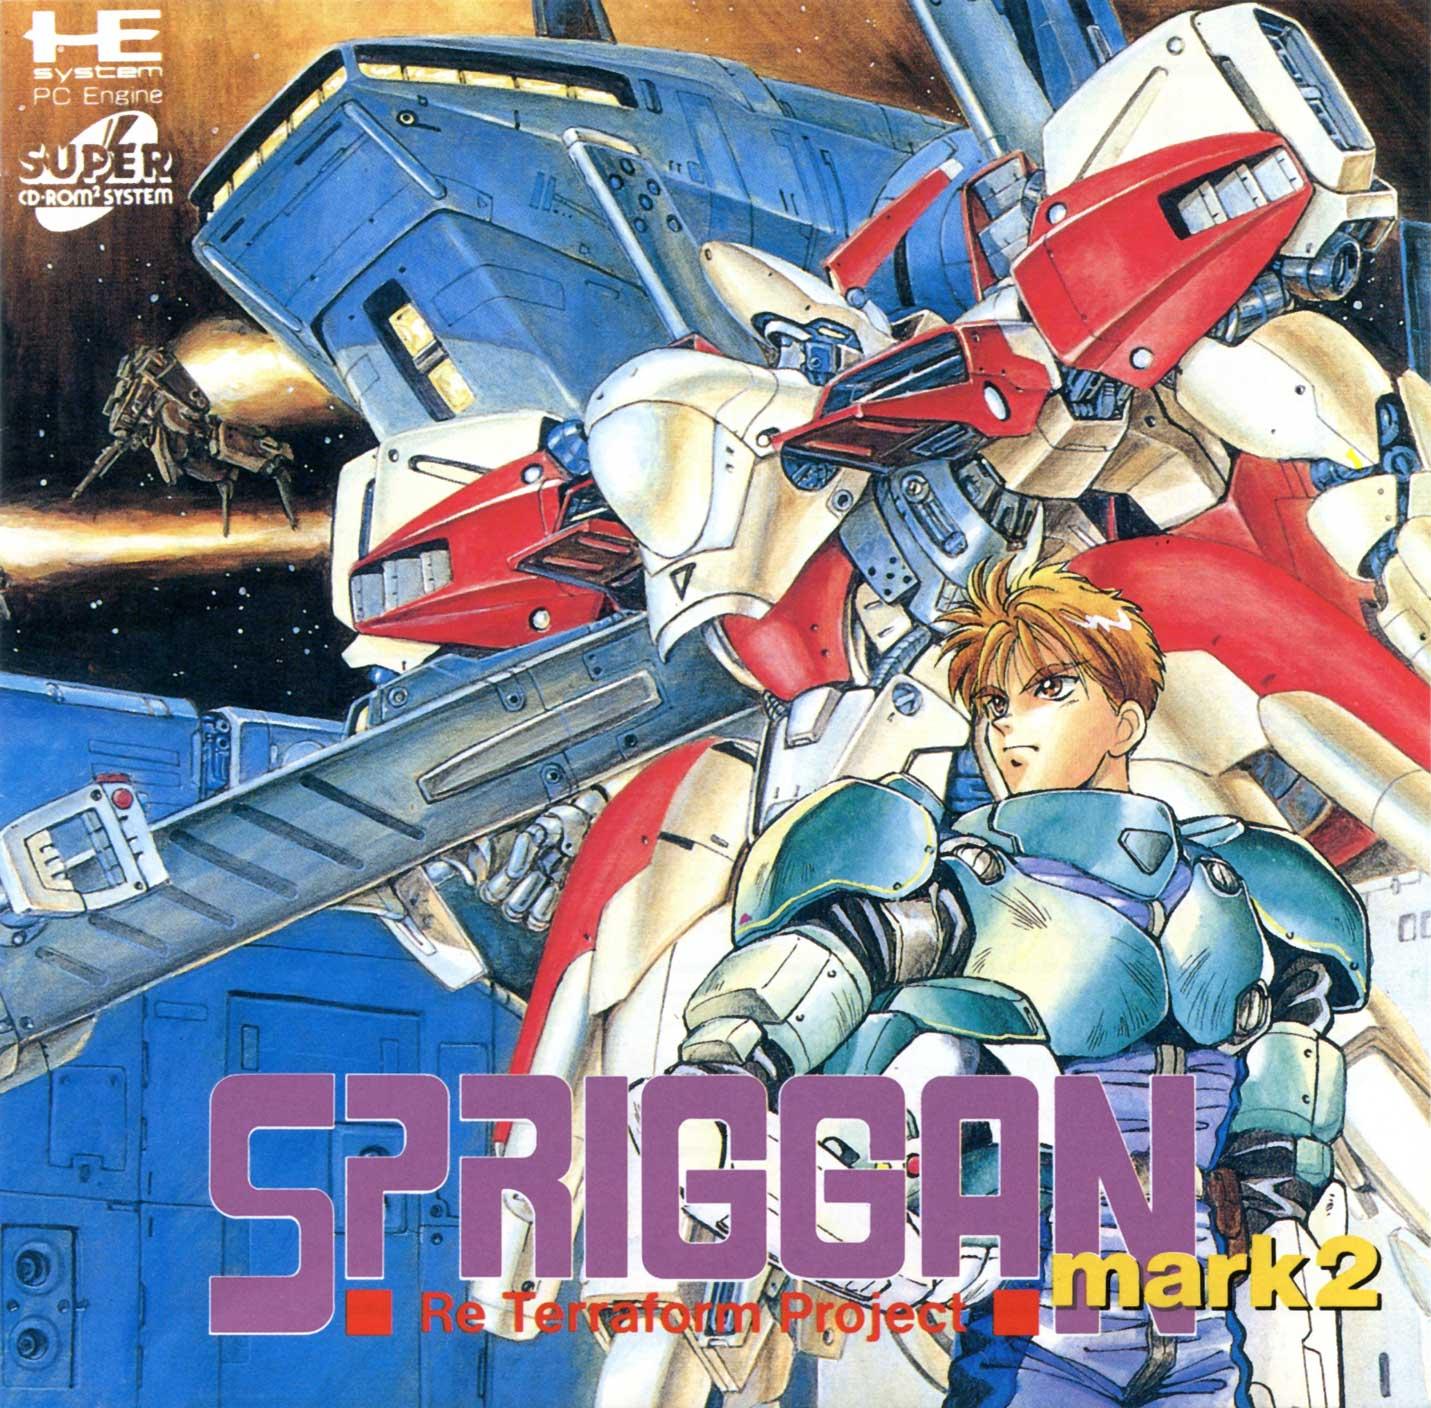 Spriggan Mark 2  Reterraform Project  The PC Engine